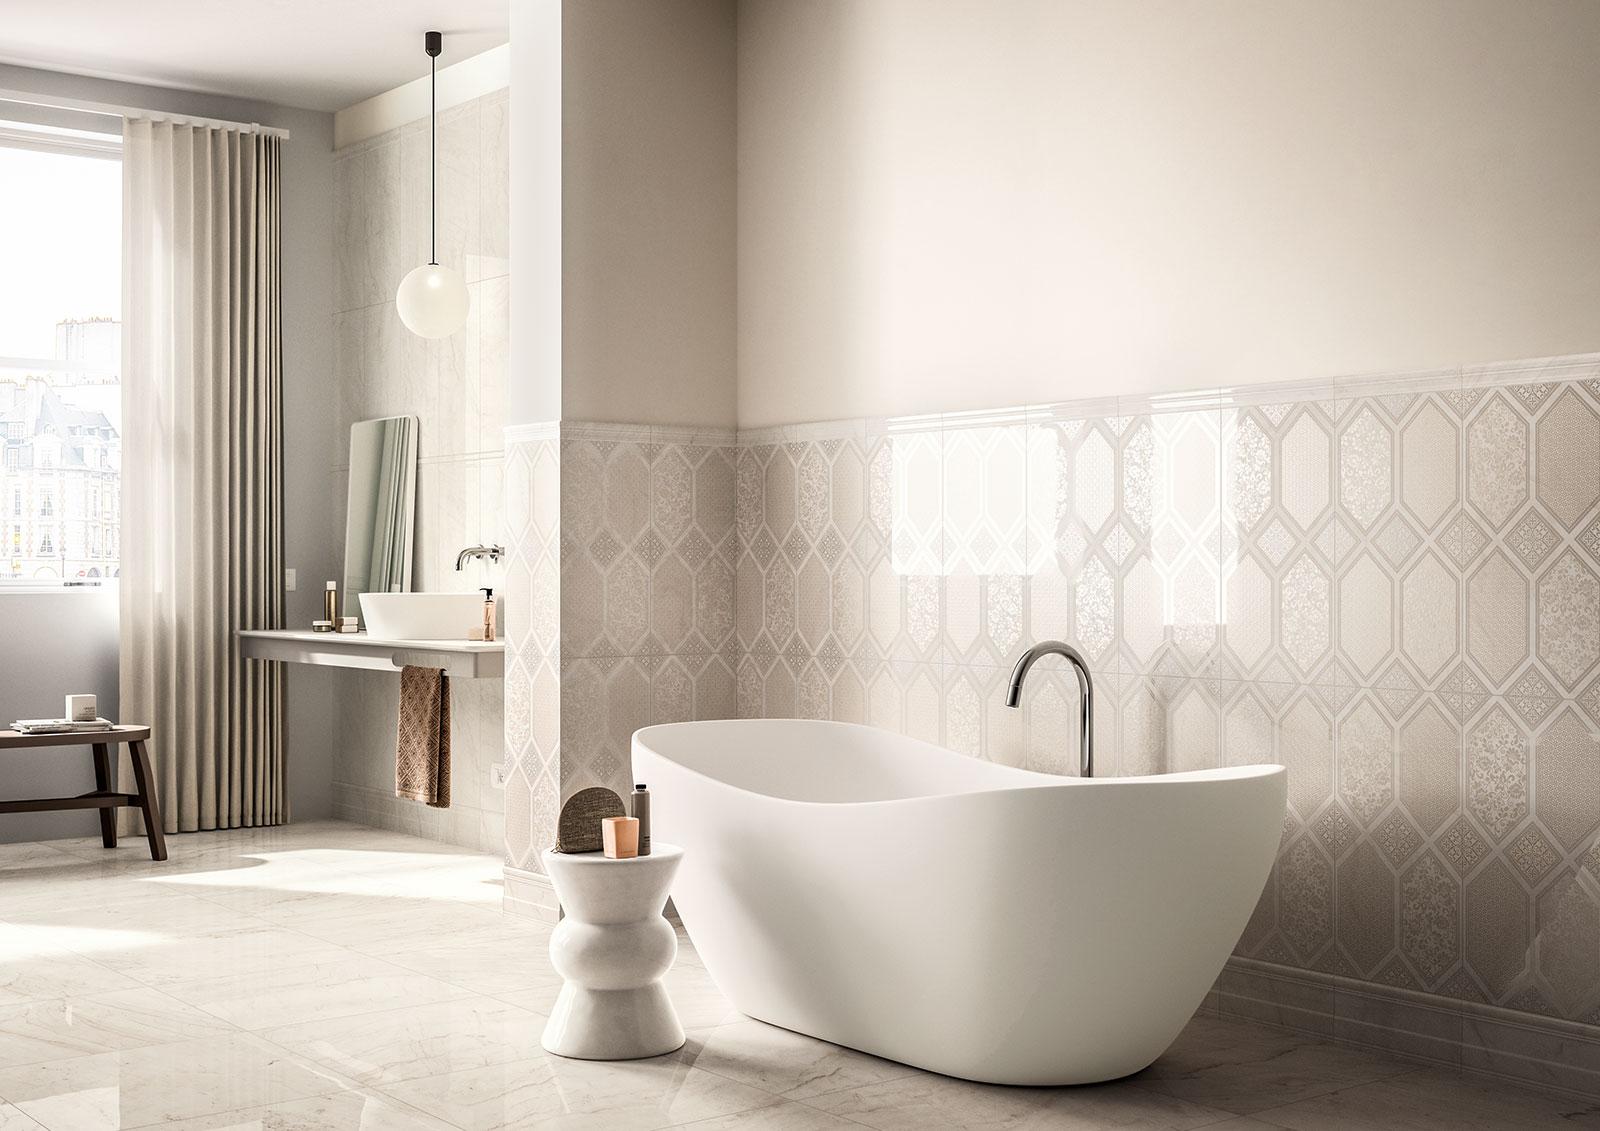 Bathroom Ceramic Tile Patterns